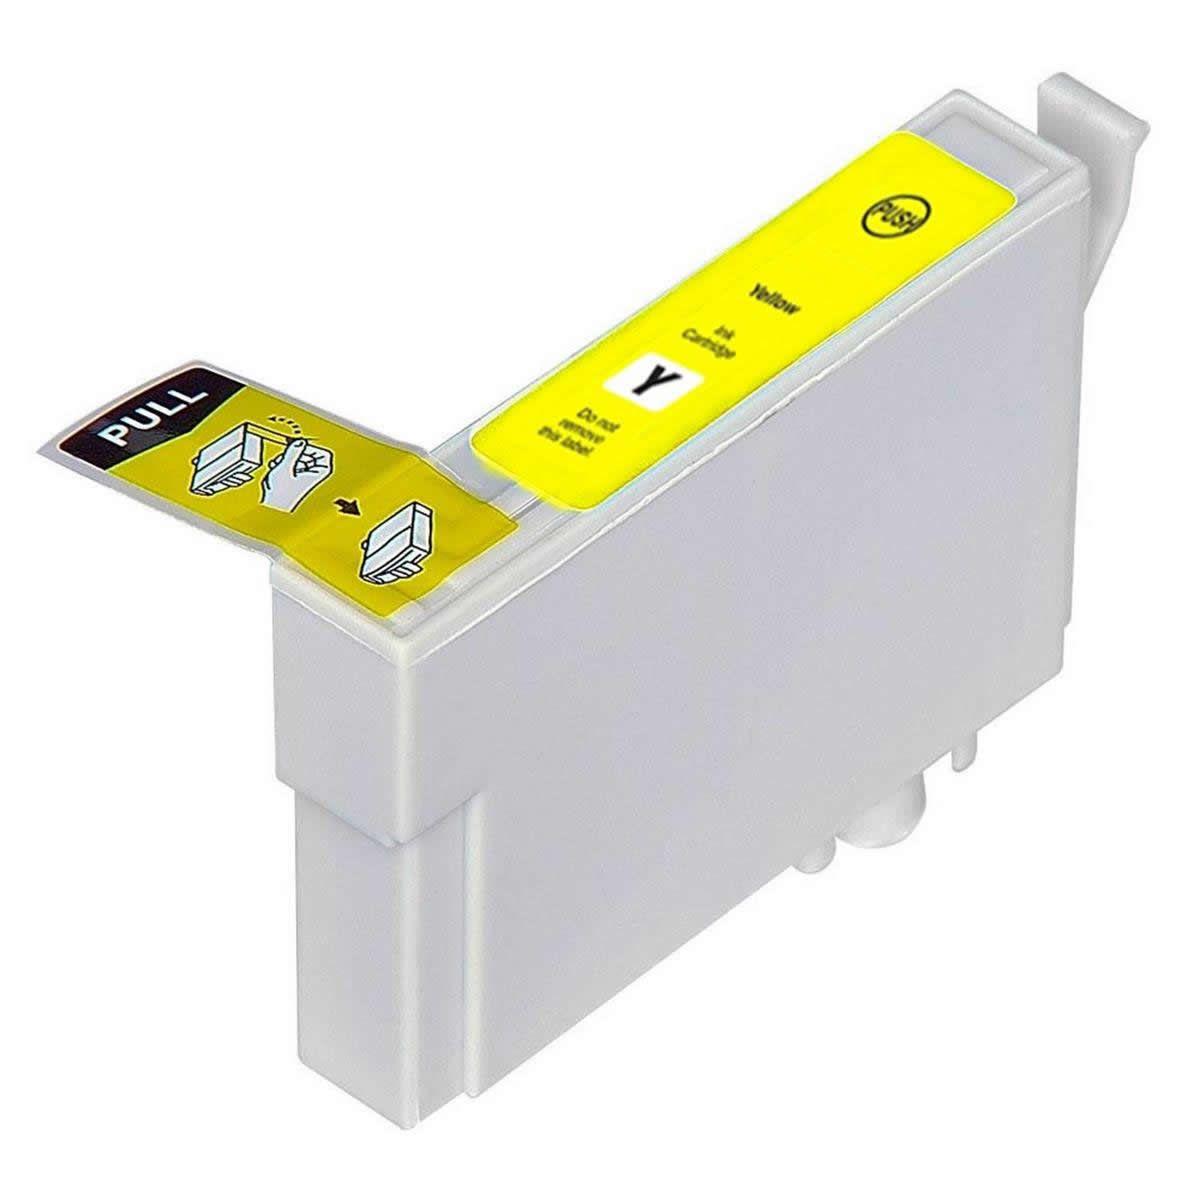 Cartucho MJ Compatível TO634 Amarelo para C67 C87 CX3700 CX4100 CX4700 CX5700F CX7700 da EPSON